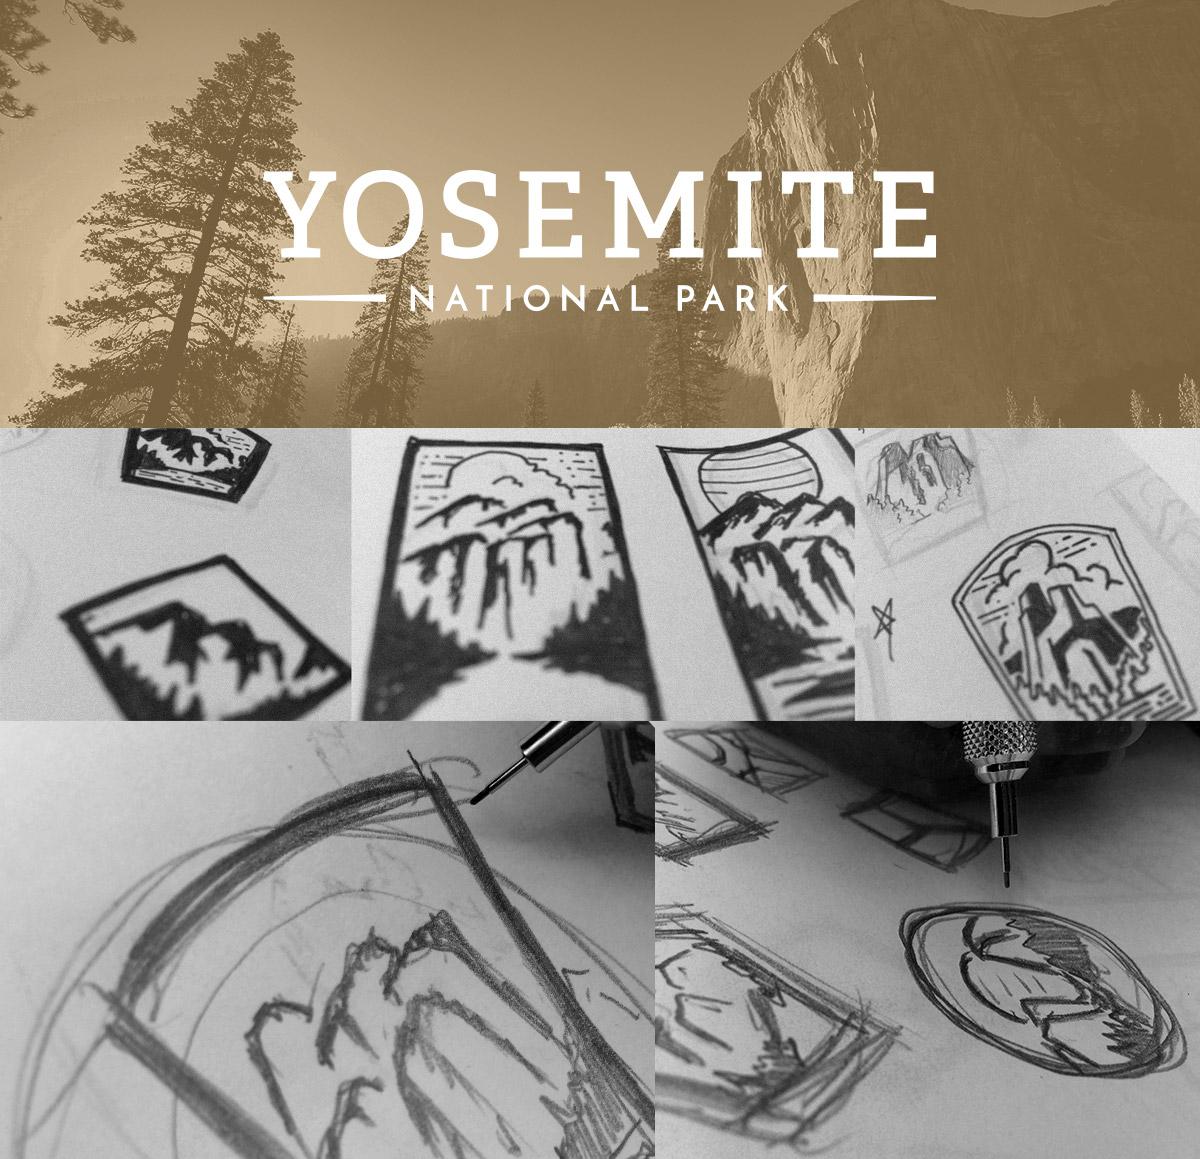 YosemiteBlogPost_02